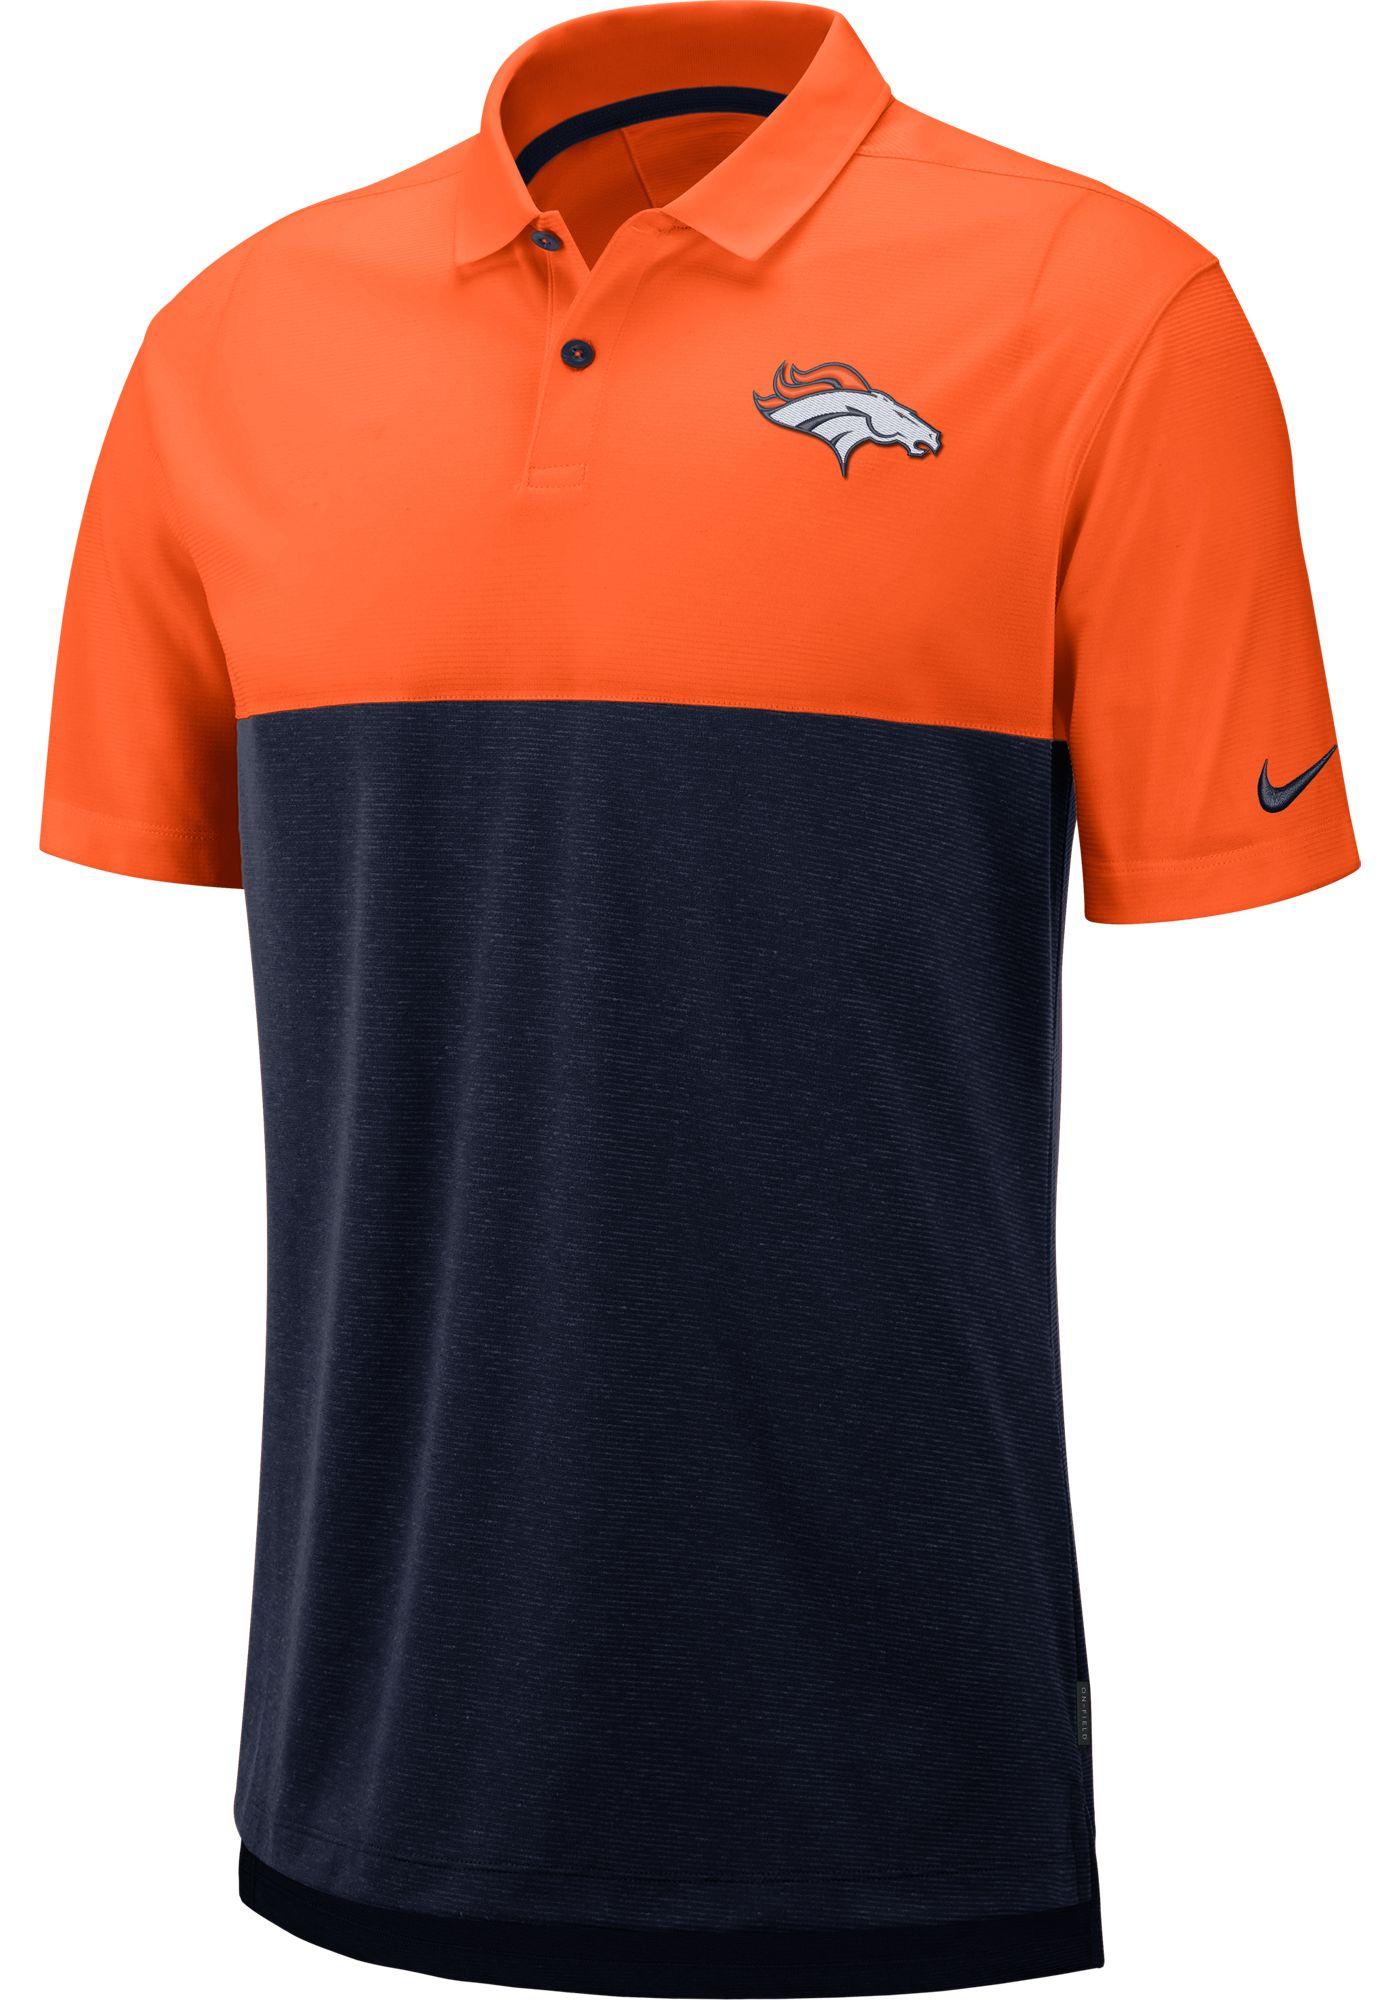 Nike Men's Denver Broncos Sideline Early Season Orange Polo